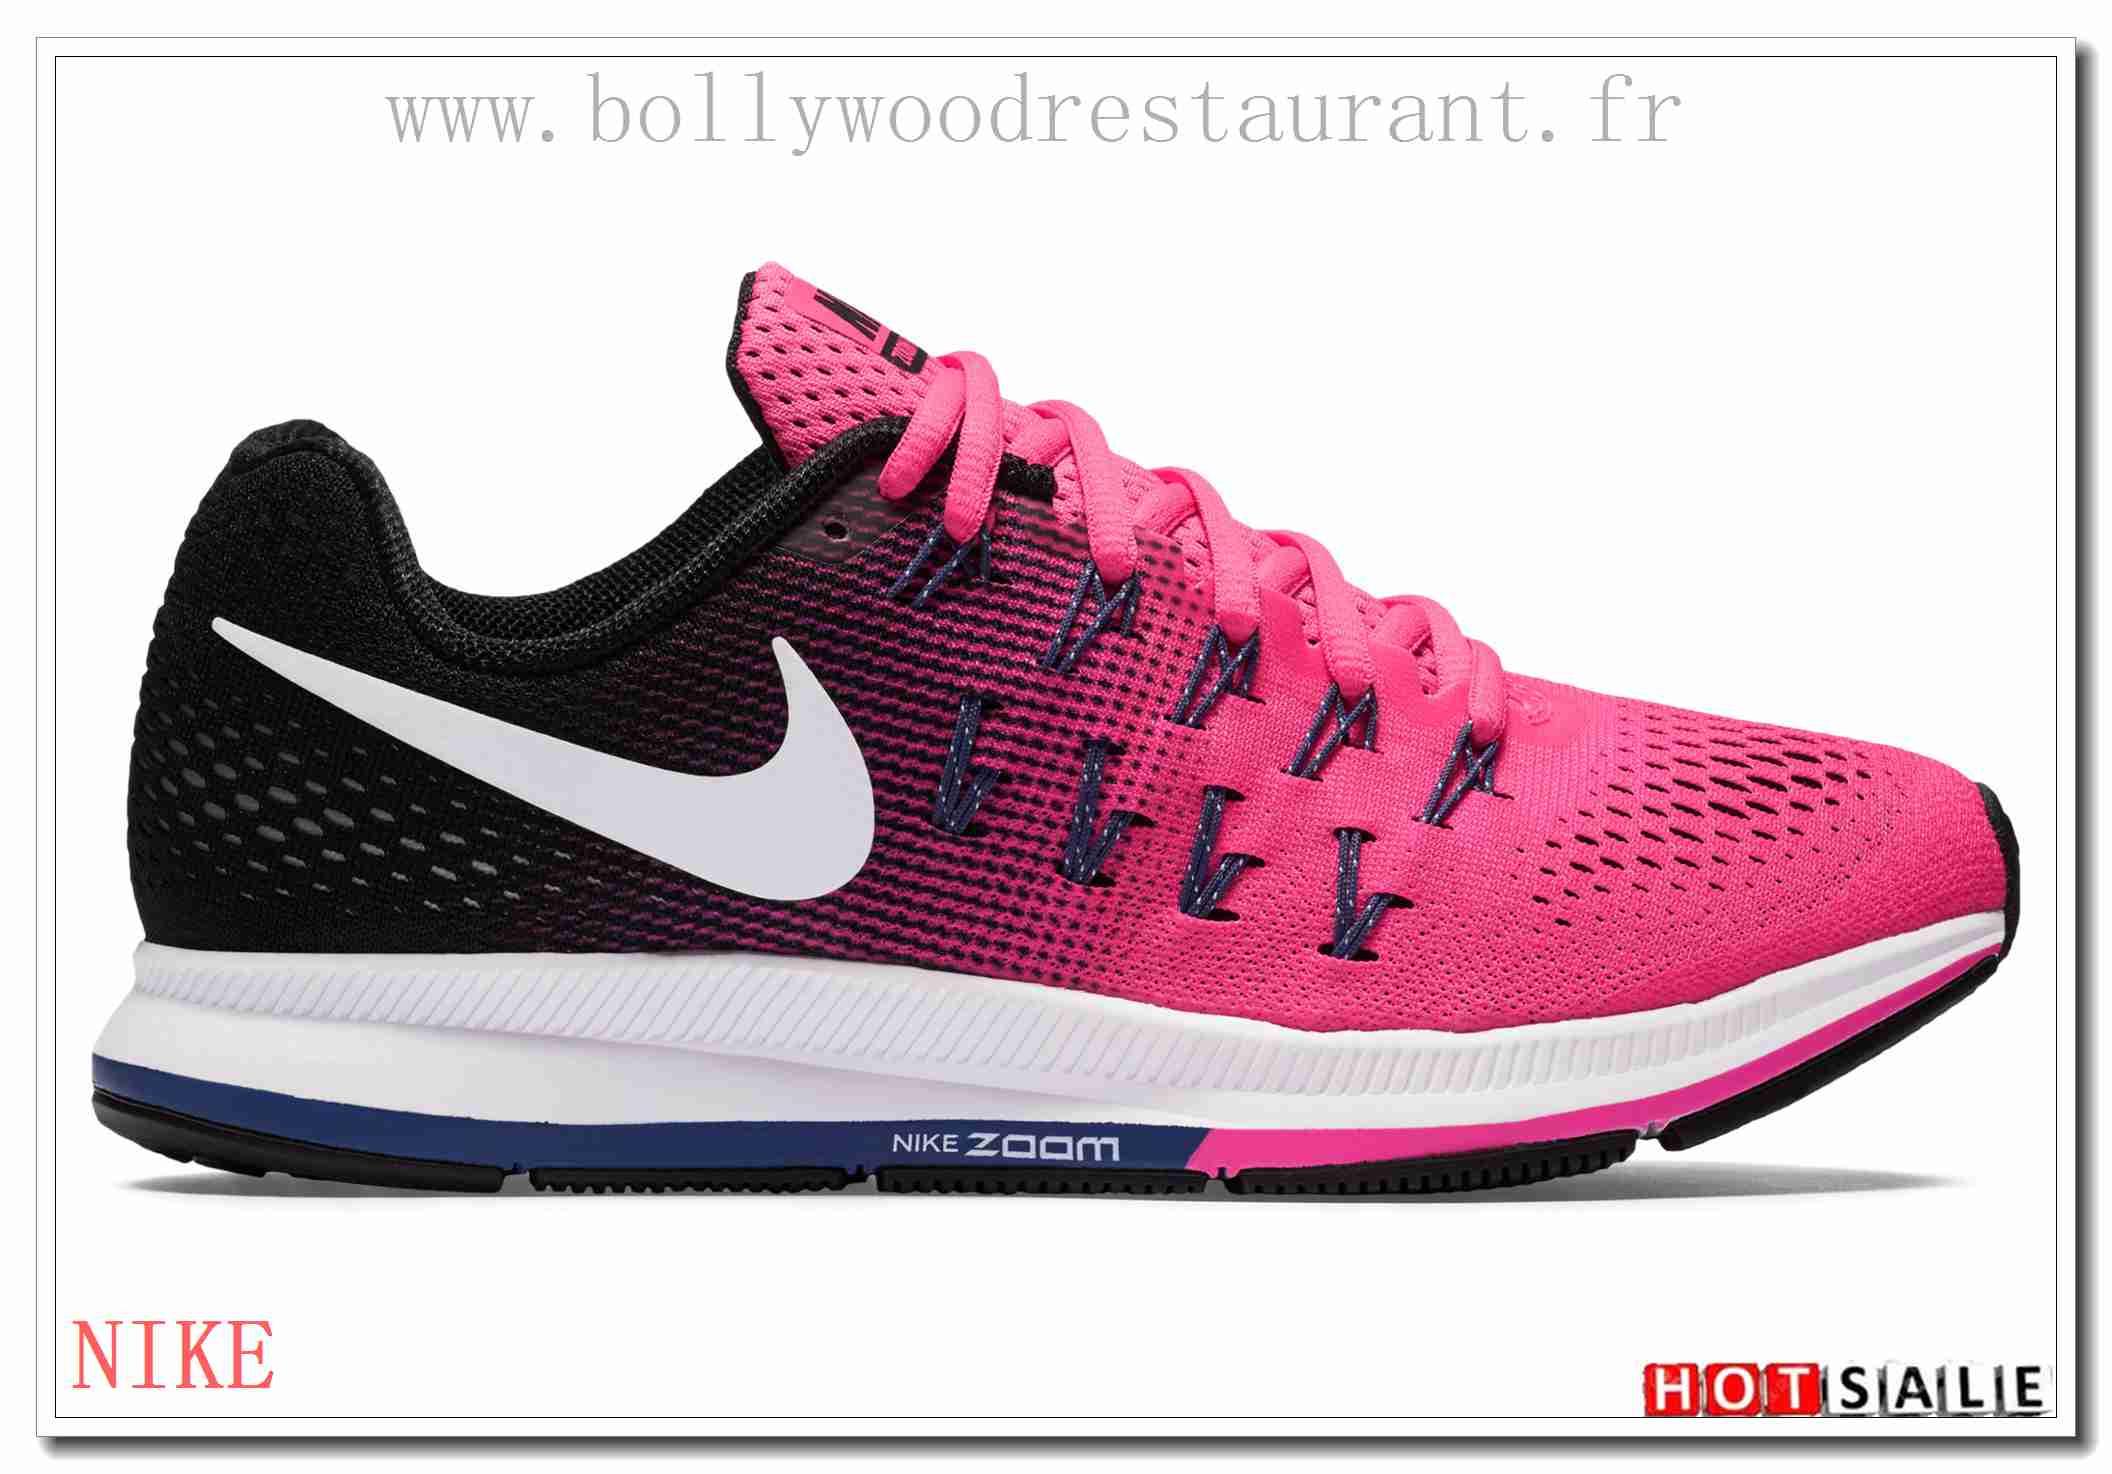 brand new 60c74 49a22 OT8320 Meilleur Prix Chaussure 2018 Nouveau style Nike Air Zoom Pegasus 33  - Femme Chaussures -